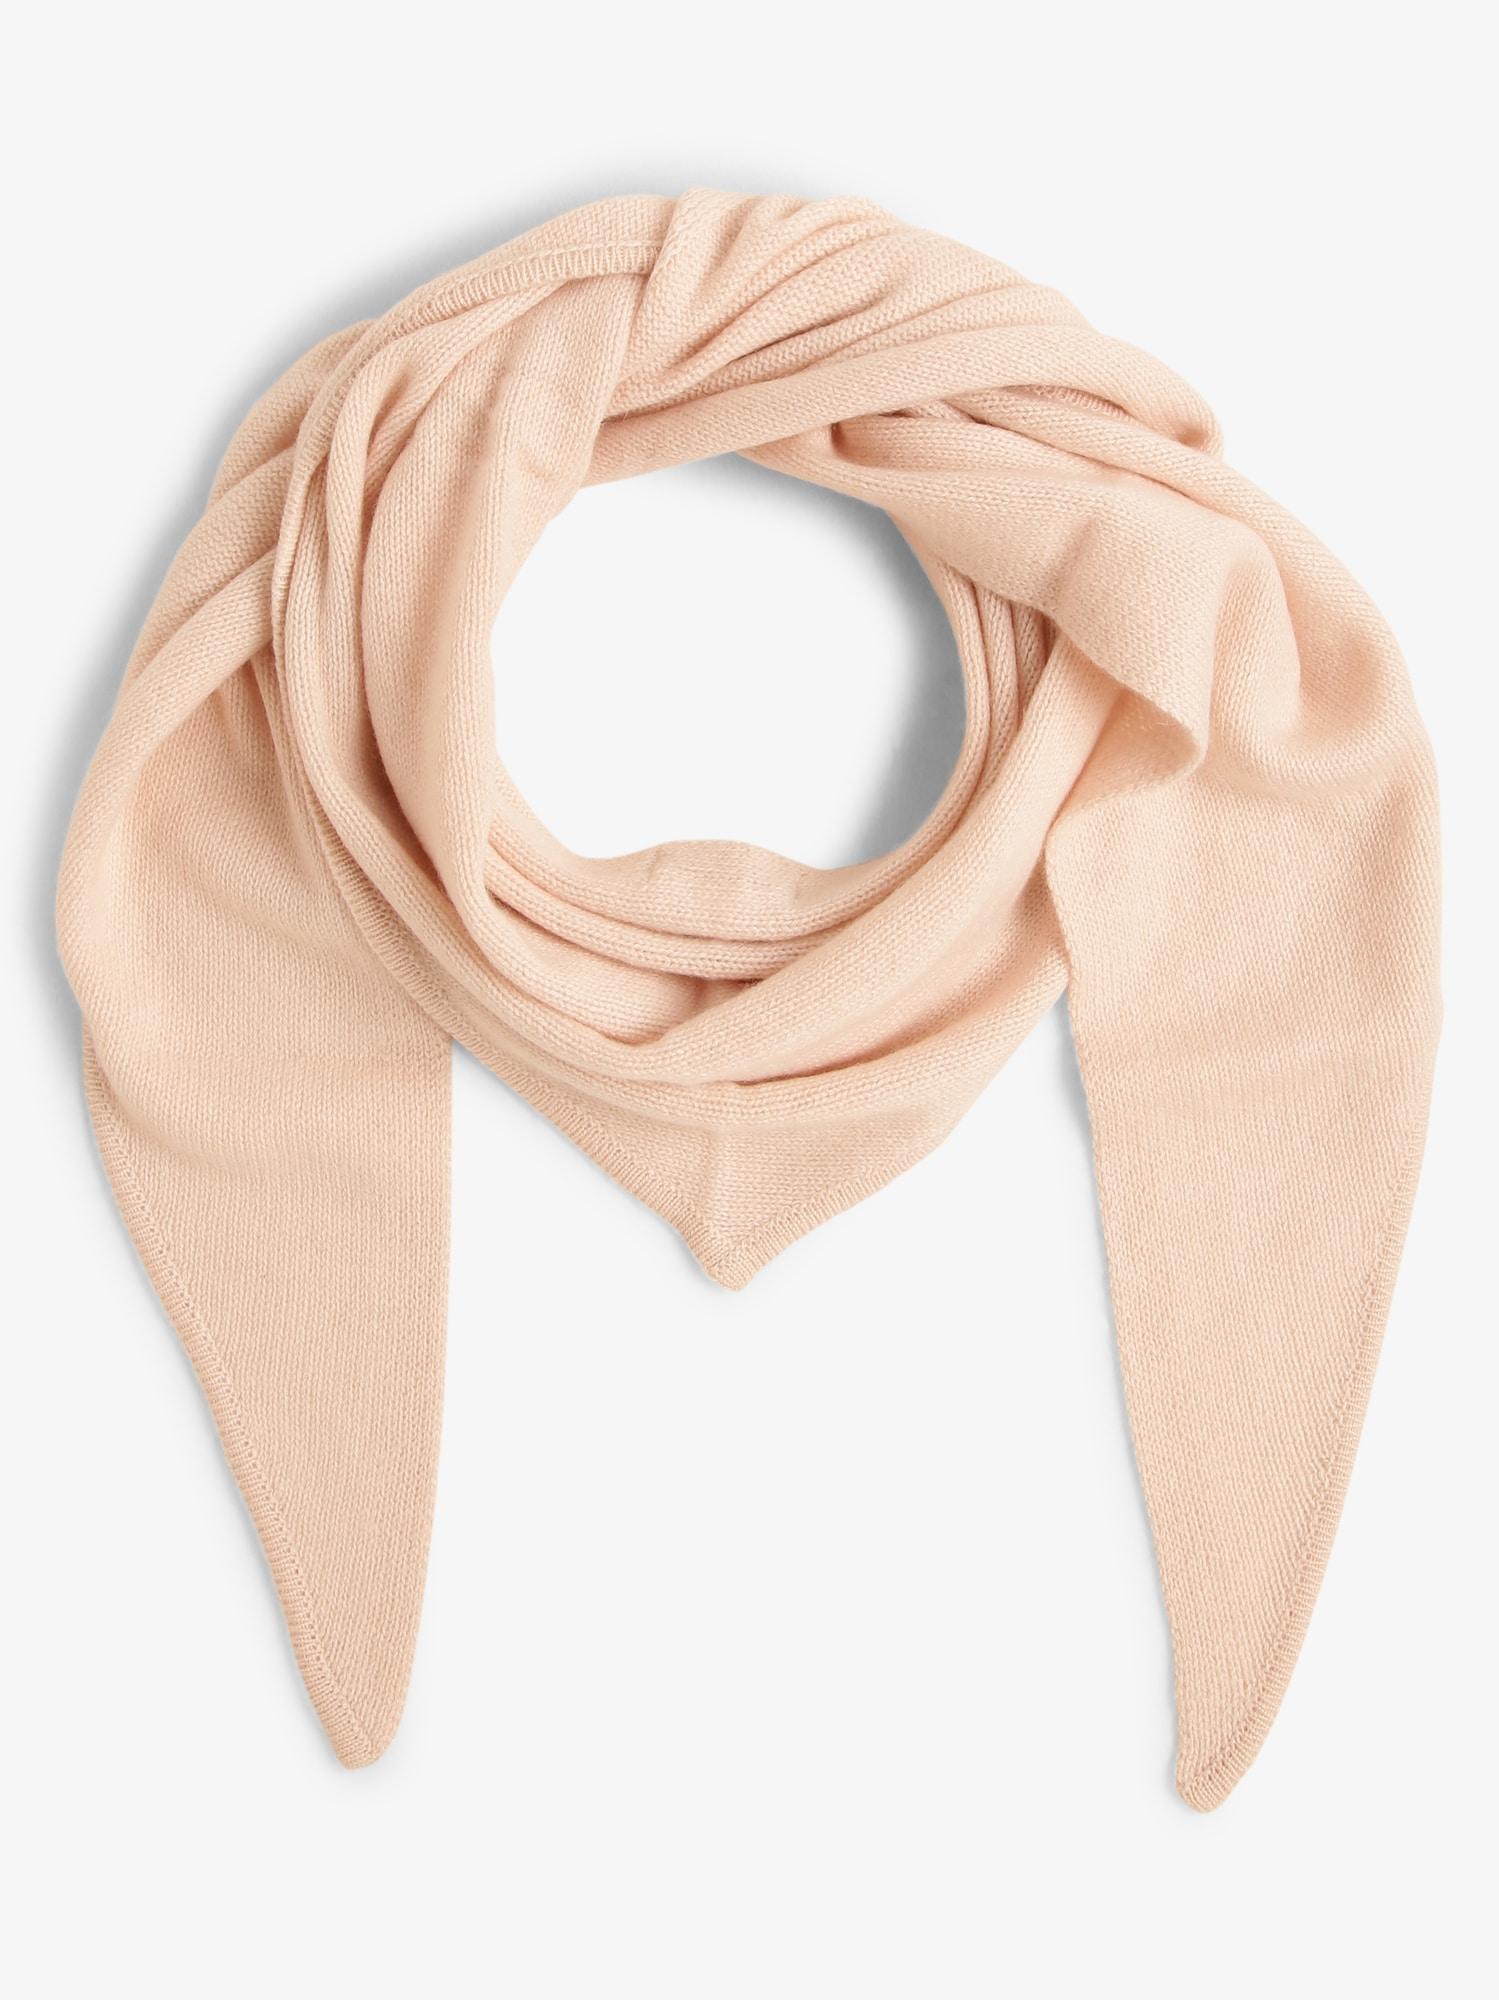 Schal | Accessoires > Schals & Tücher > Schals | Apriori